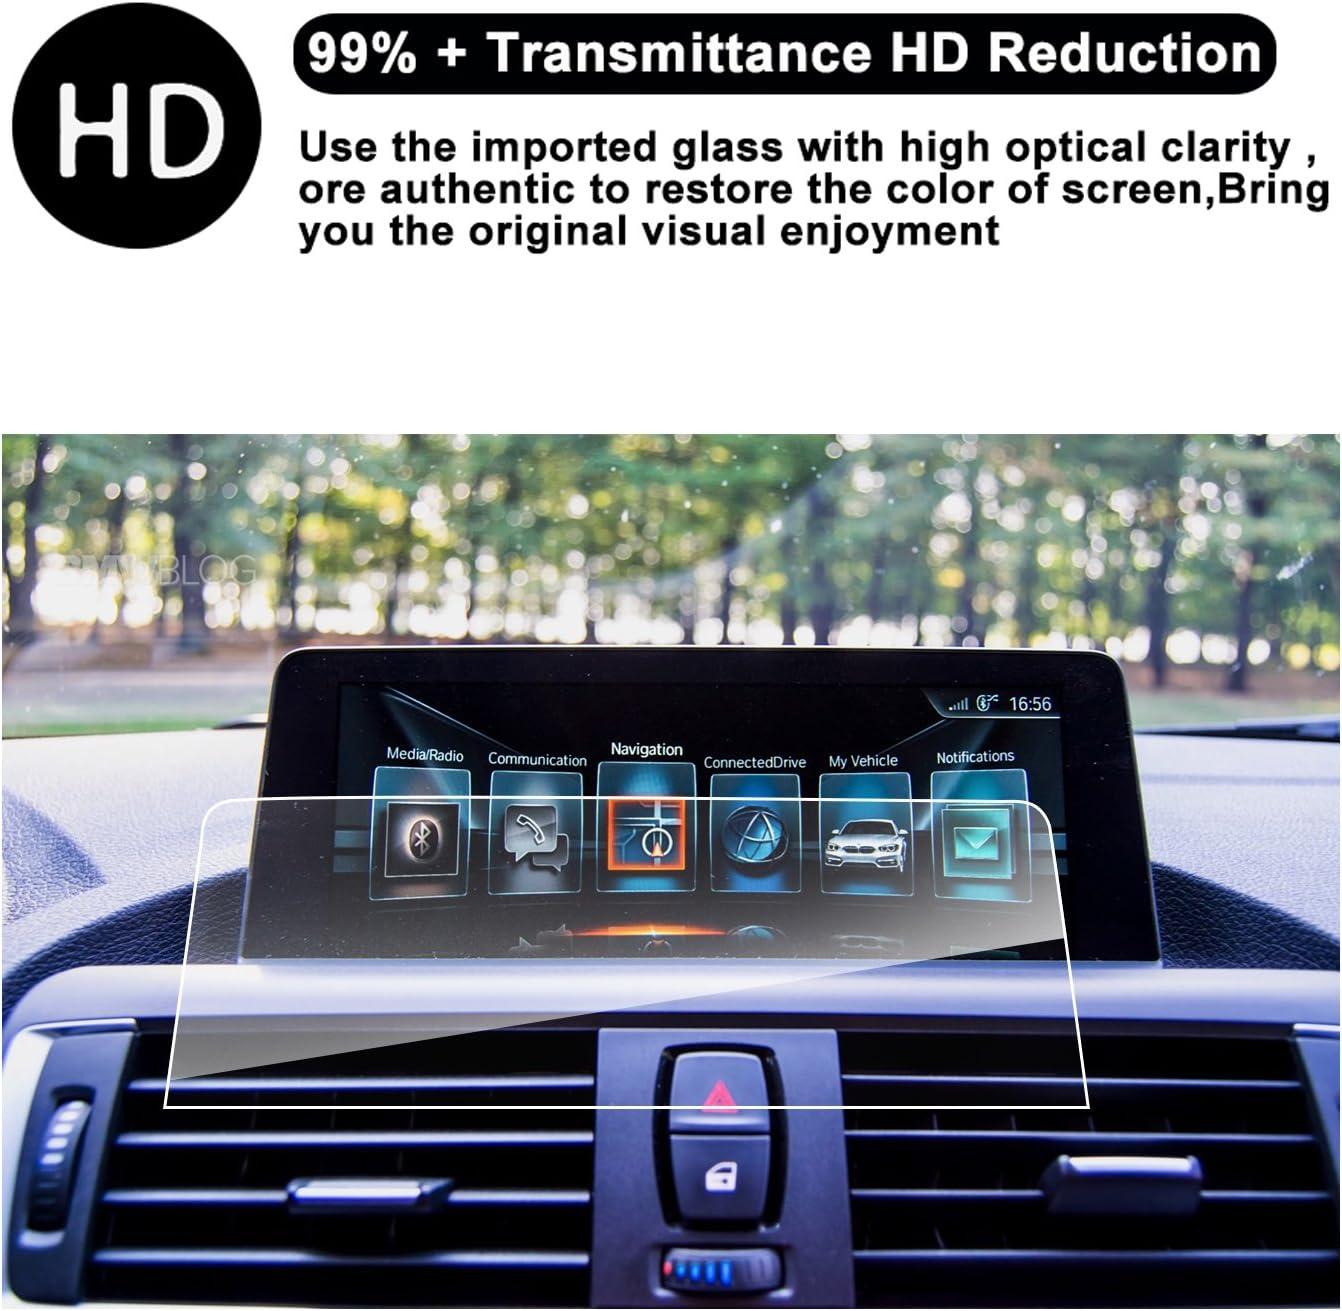 RUIYA Tempered Glass Screen Protector for Navigation System iDrive NBT of (2012 2017)BMW 3 Series GT M3 F30|F31|F34 ,BMW (2013 2017) 4 Series M4